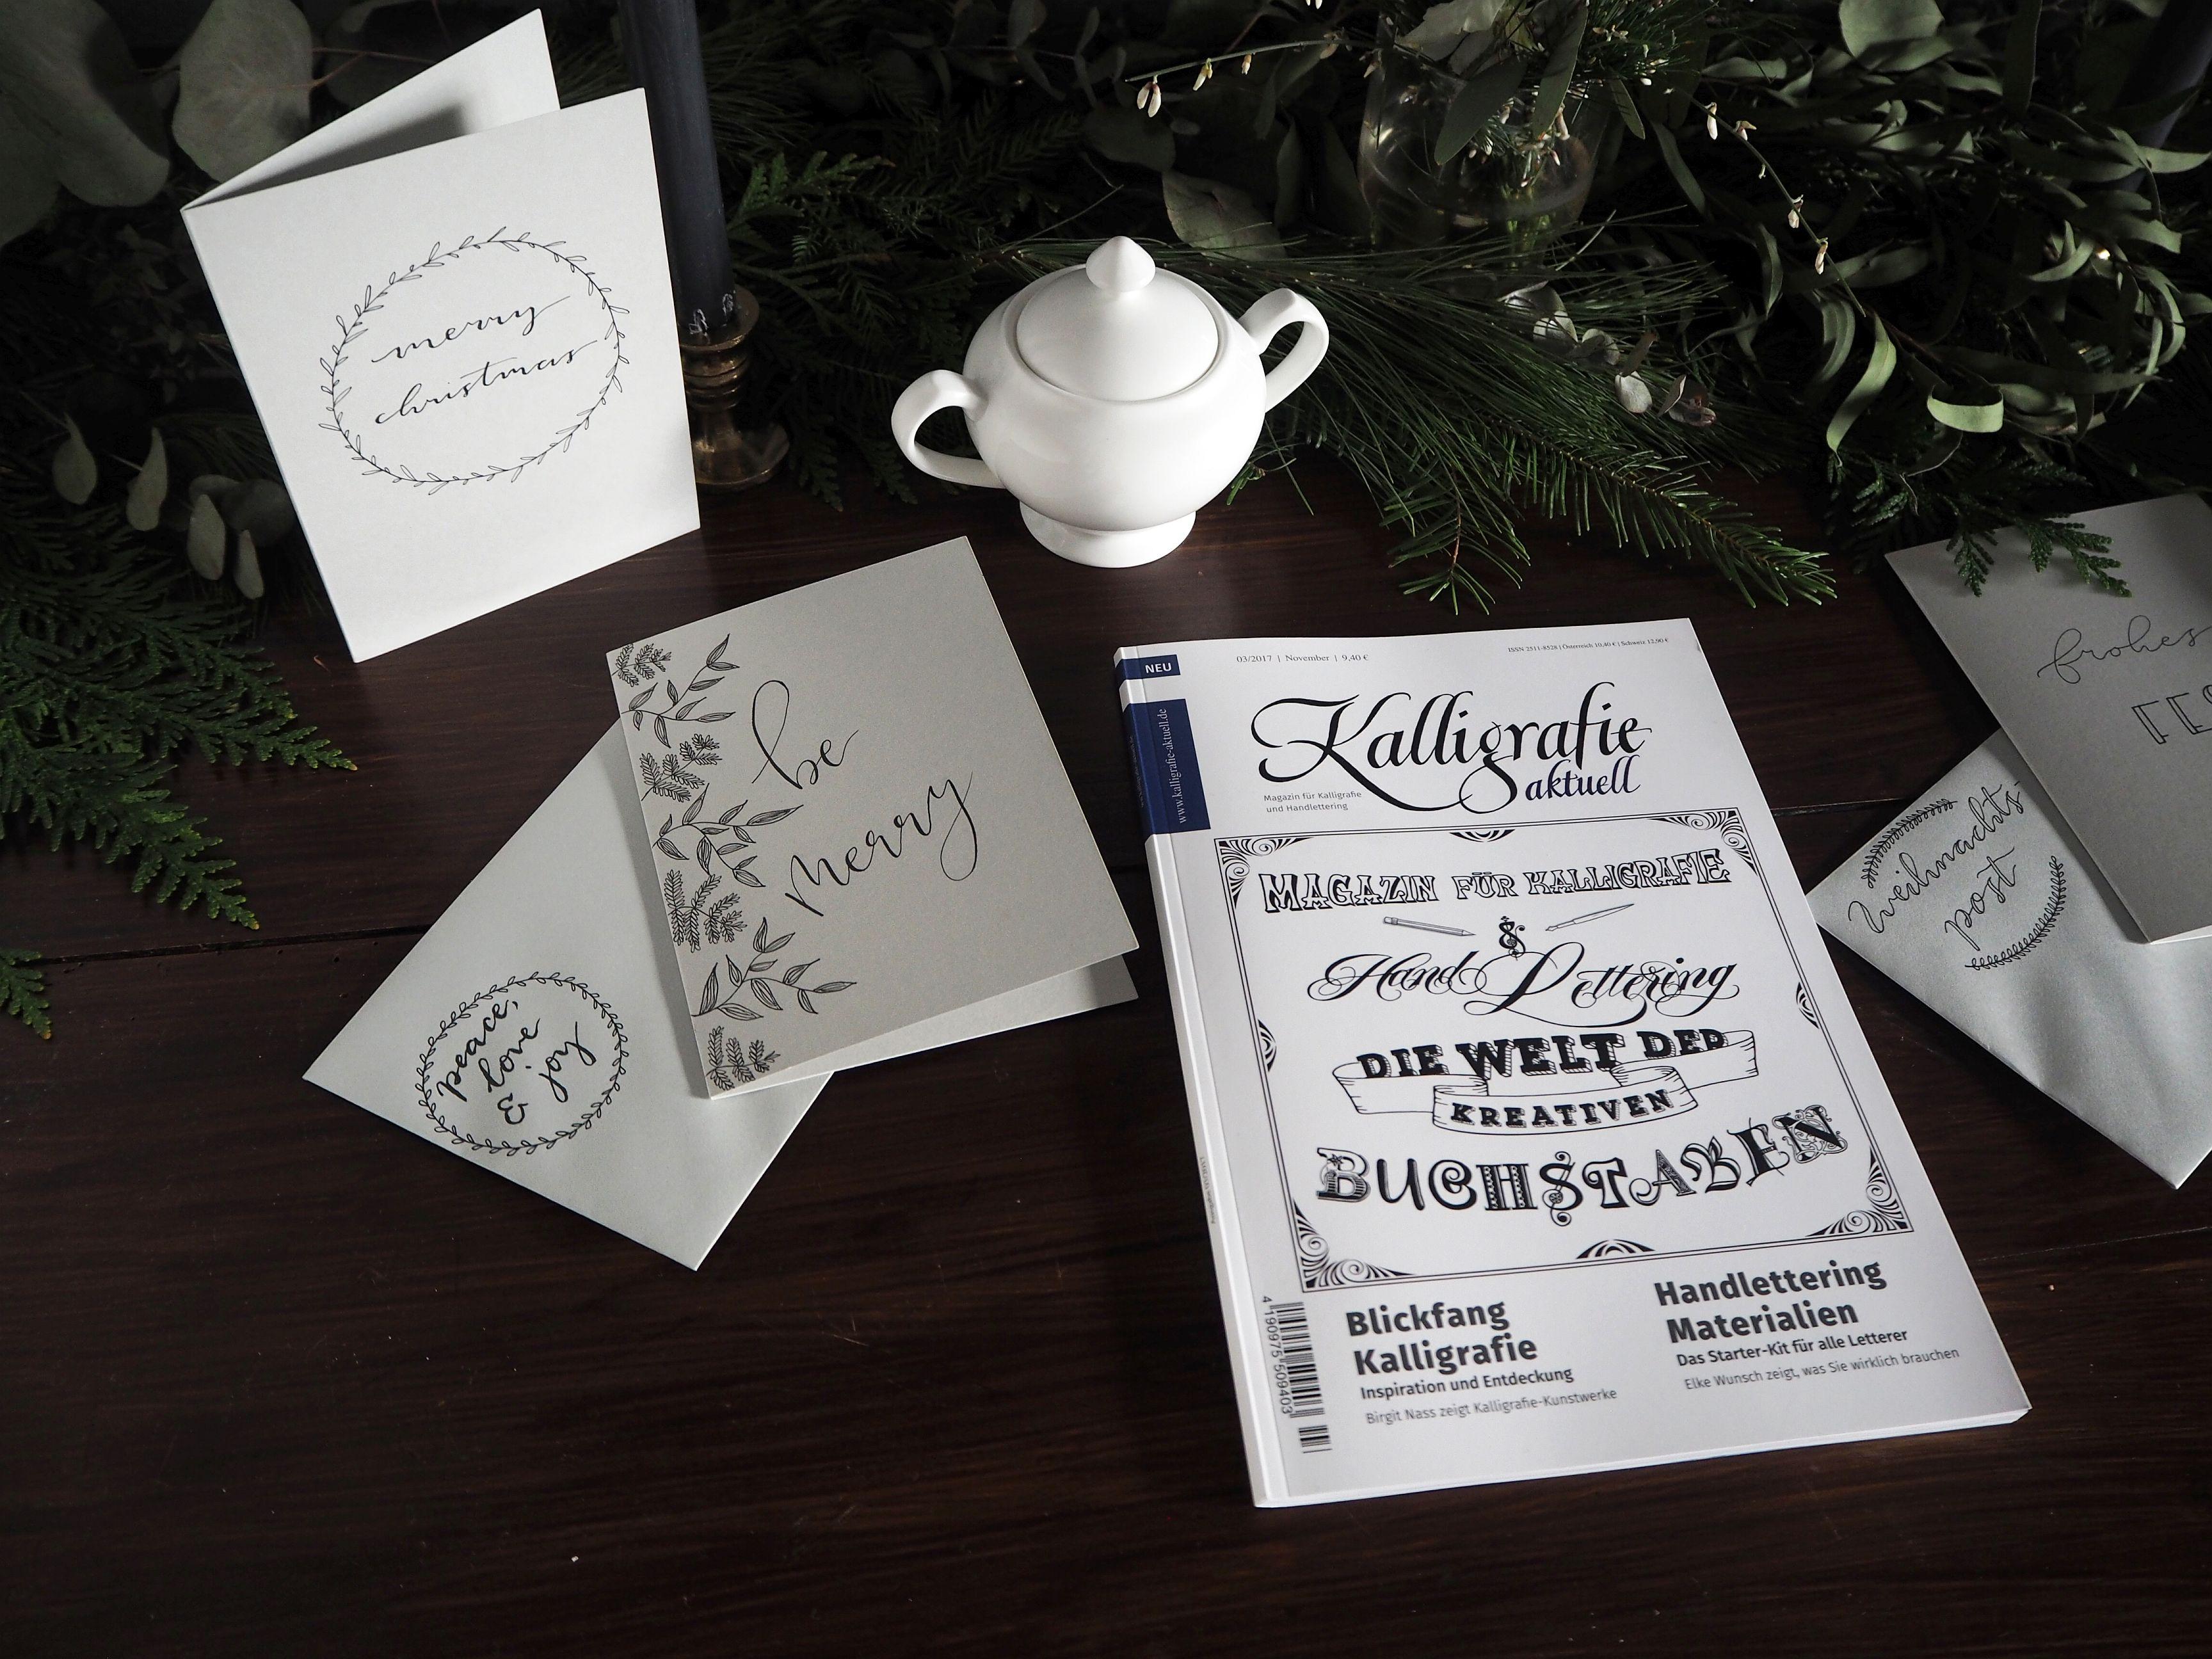 2017-12-skoen-och-kreativ-sonntagslektuere-zeitschrift-kalligrafie-aktuell (23)